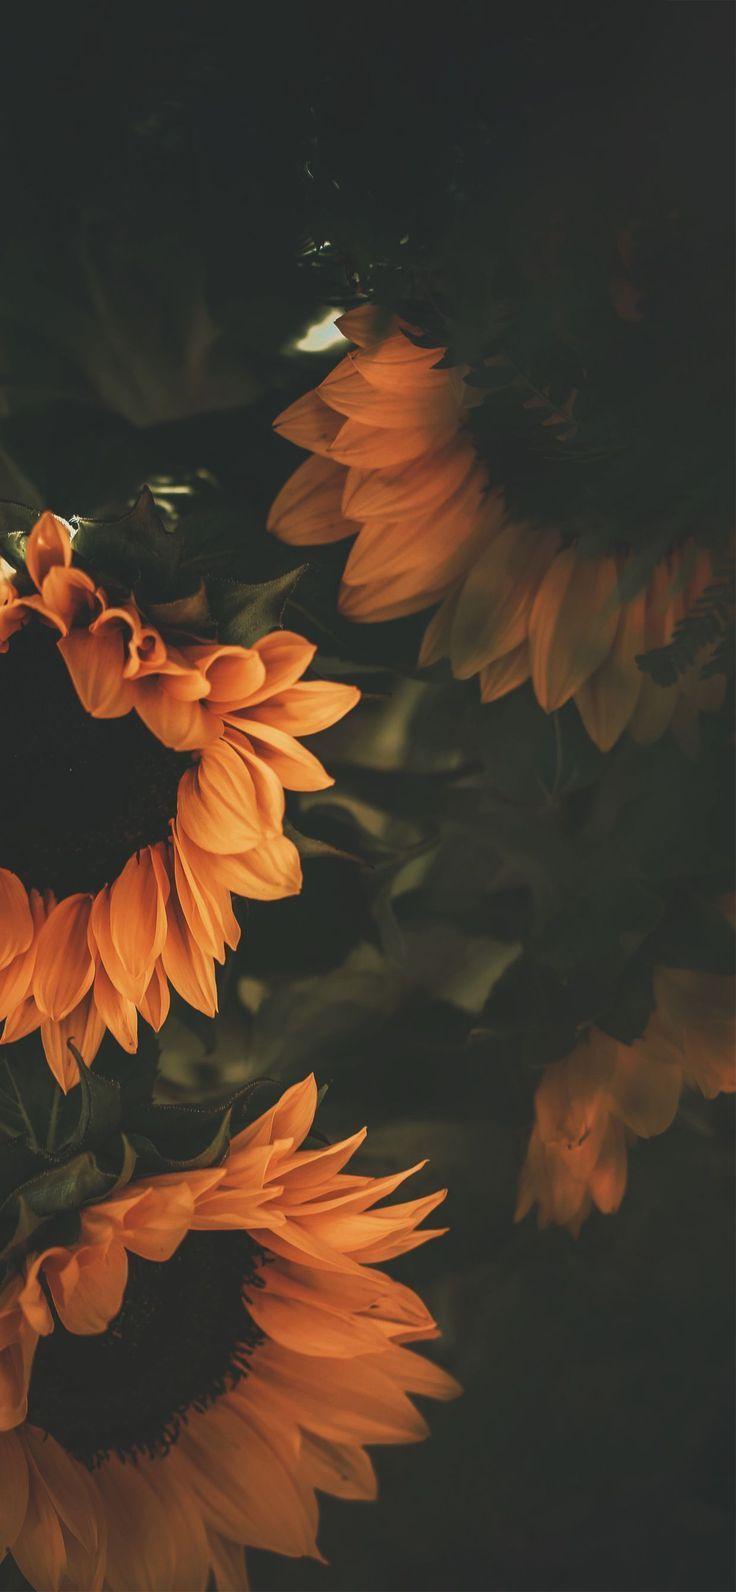 wallpaper iphone xs, girasoli, fiori